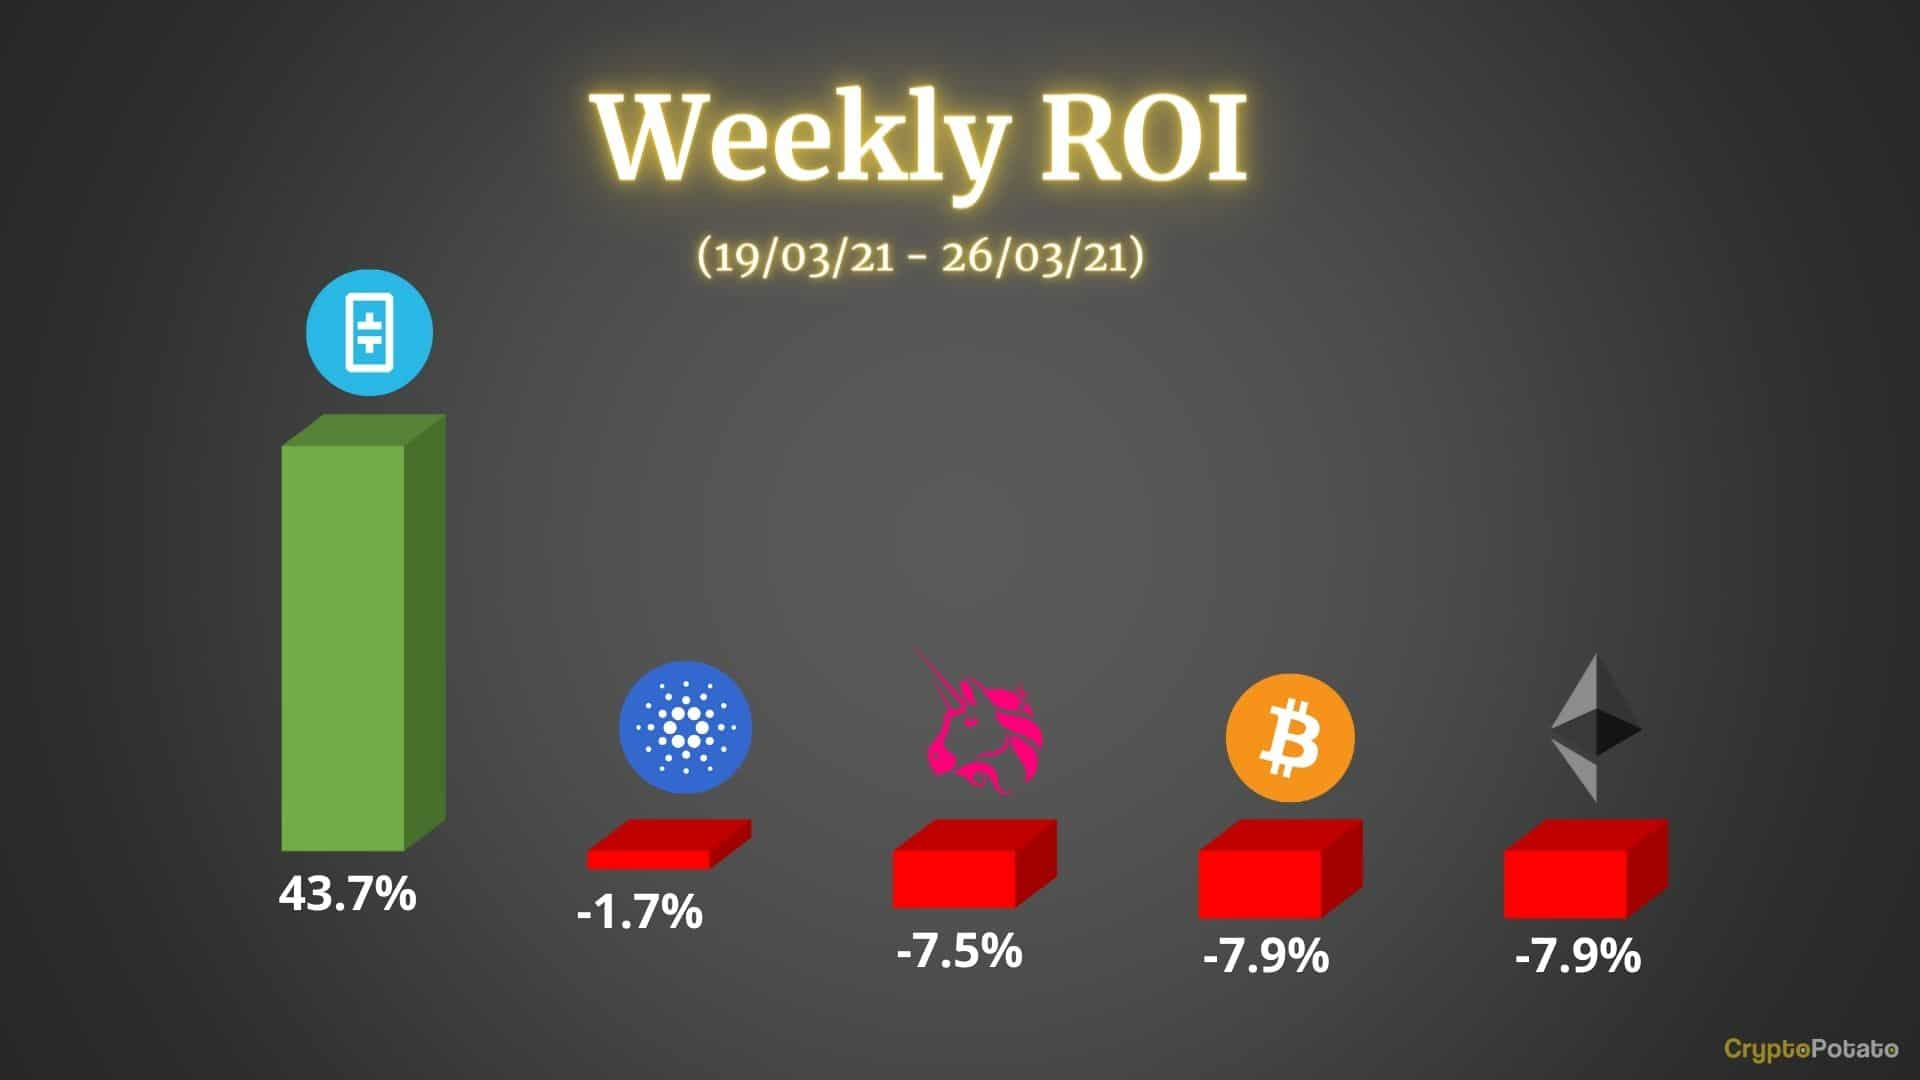 Crypto Price Analysis & Overview March 26th: Bitcoin, Ethereum, Cardano, Uniswap, and Theta